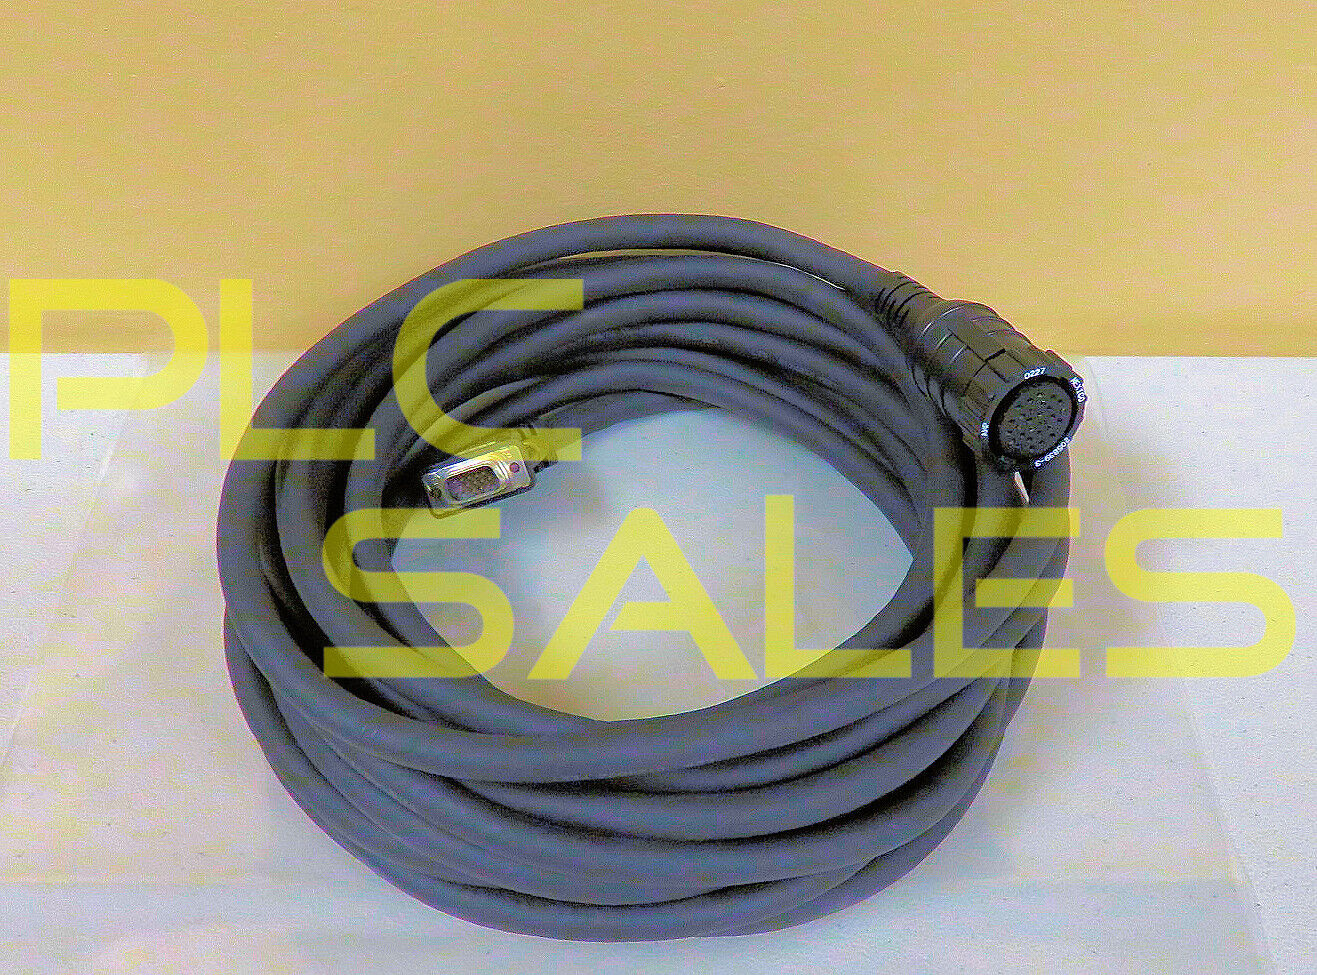 Allen Bradley 2090 Uxnfby S09 Y Series Motor Feedback Cable Hawkeye Ct Wiring Diagram 1 2